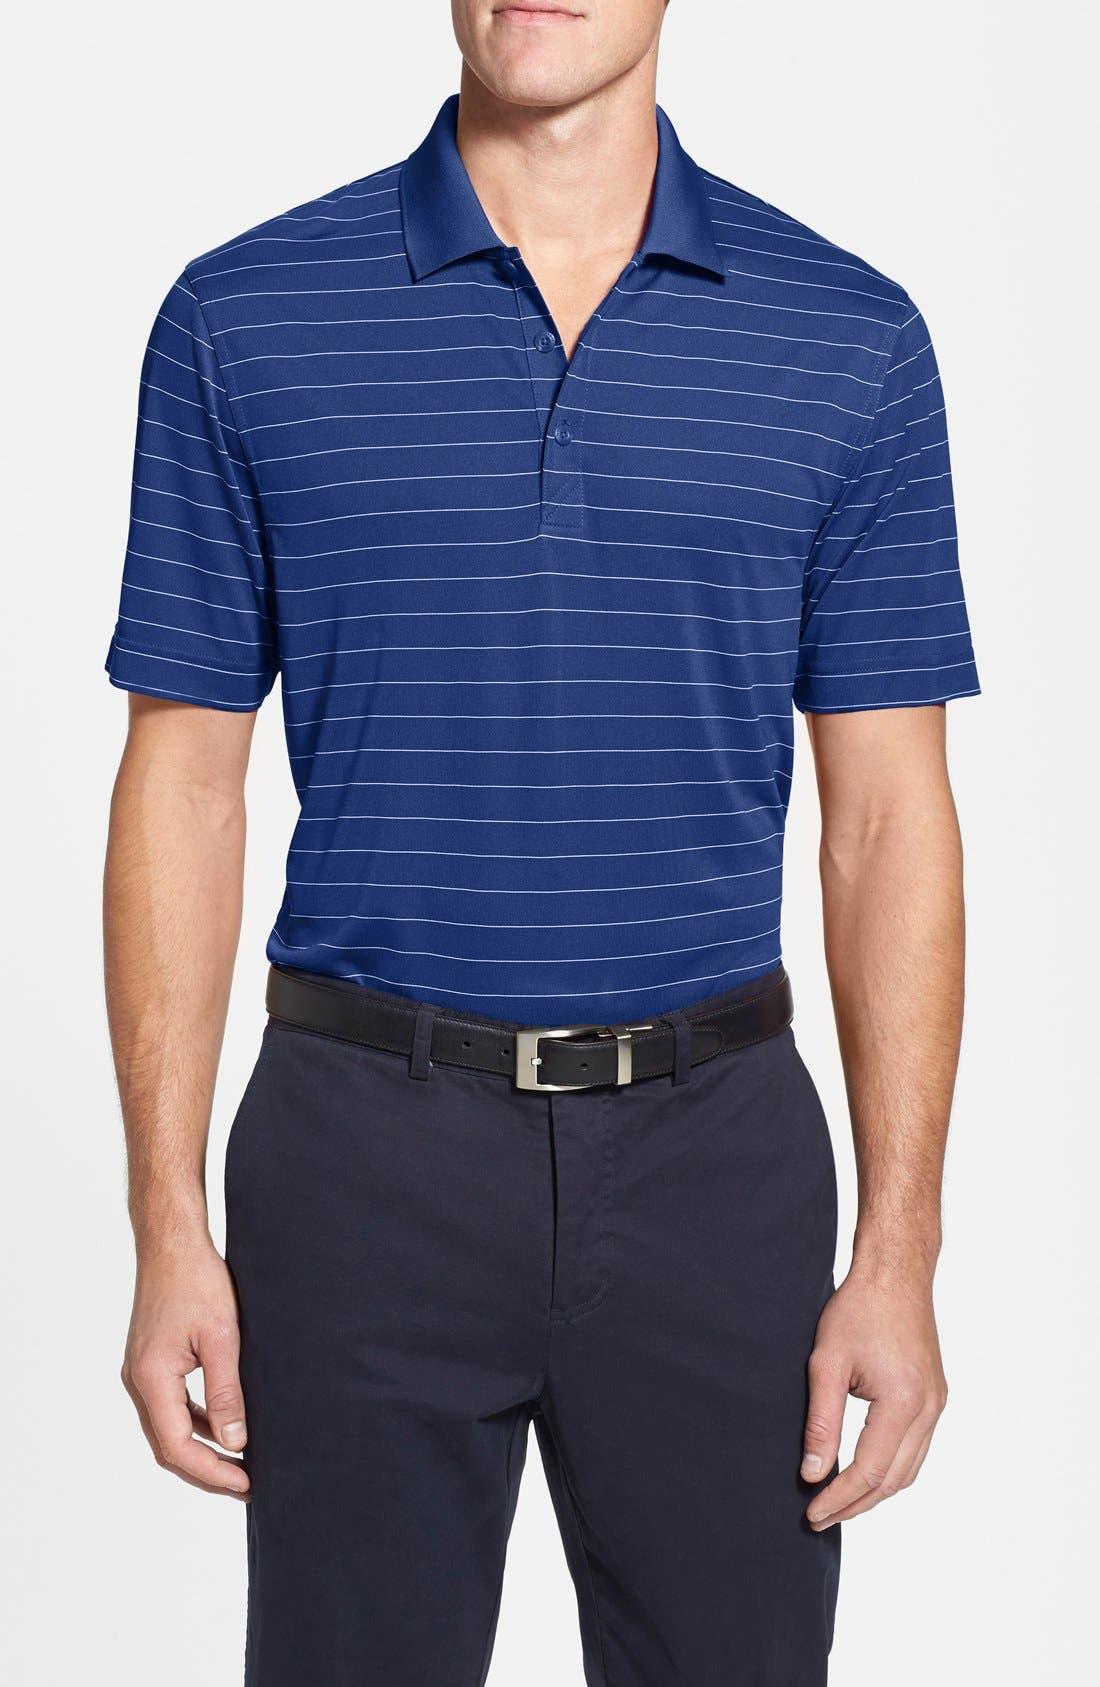 Cutter & Buck Franklin Stripe DryTec® Polo